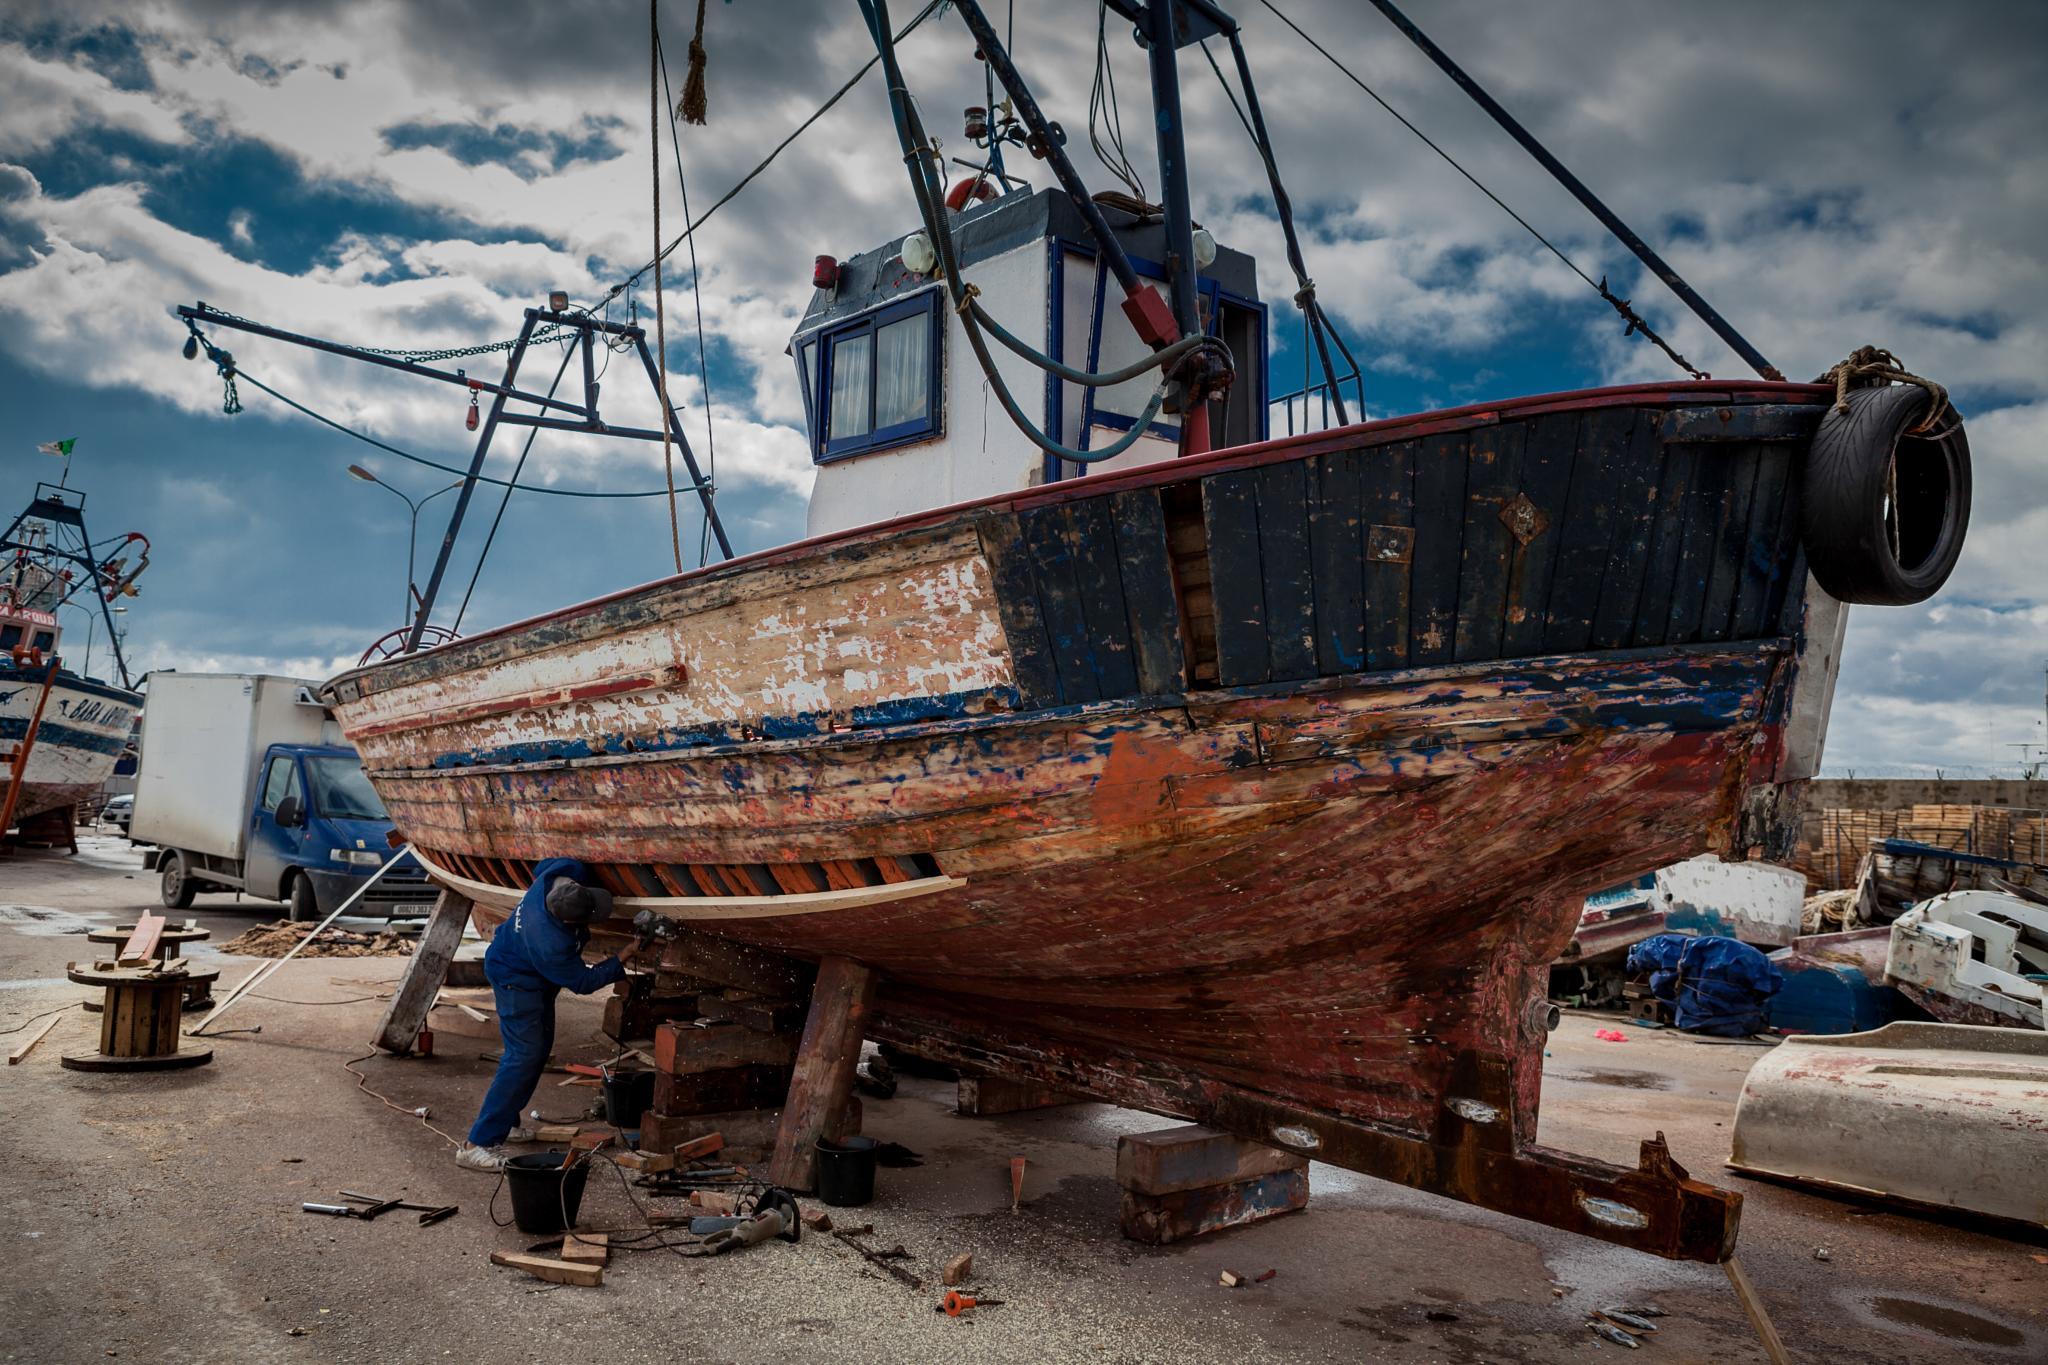 repair the boats by qomra photography